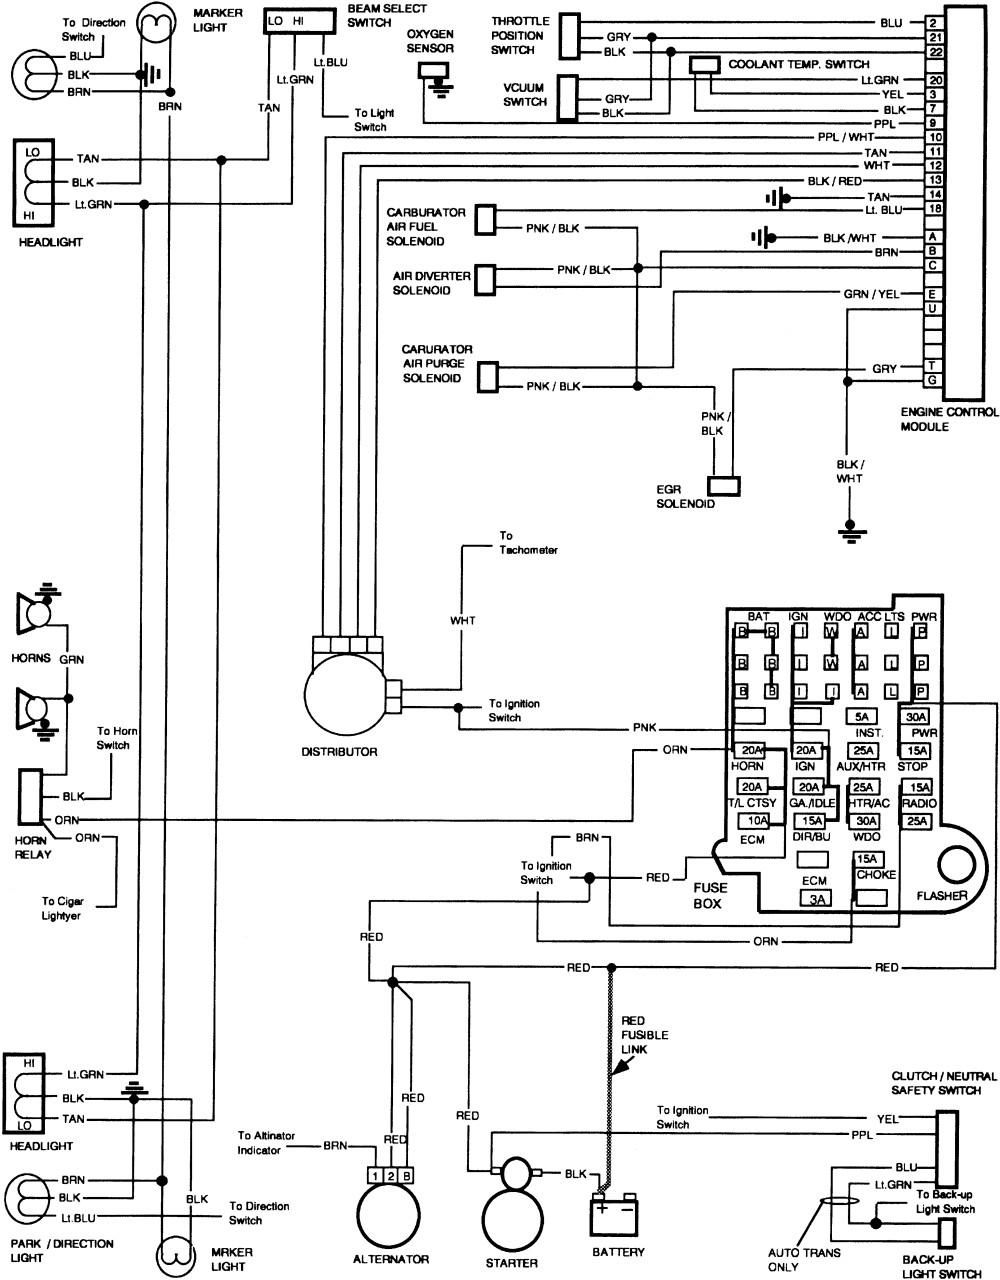 medium resolution of best of 1985 chevy truck power window wiring diagram wiring 57 ford truck light wiring 1985